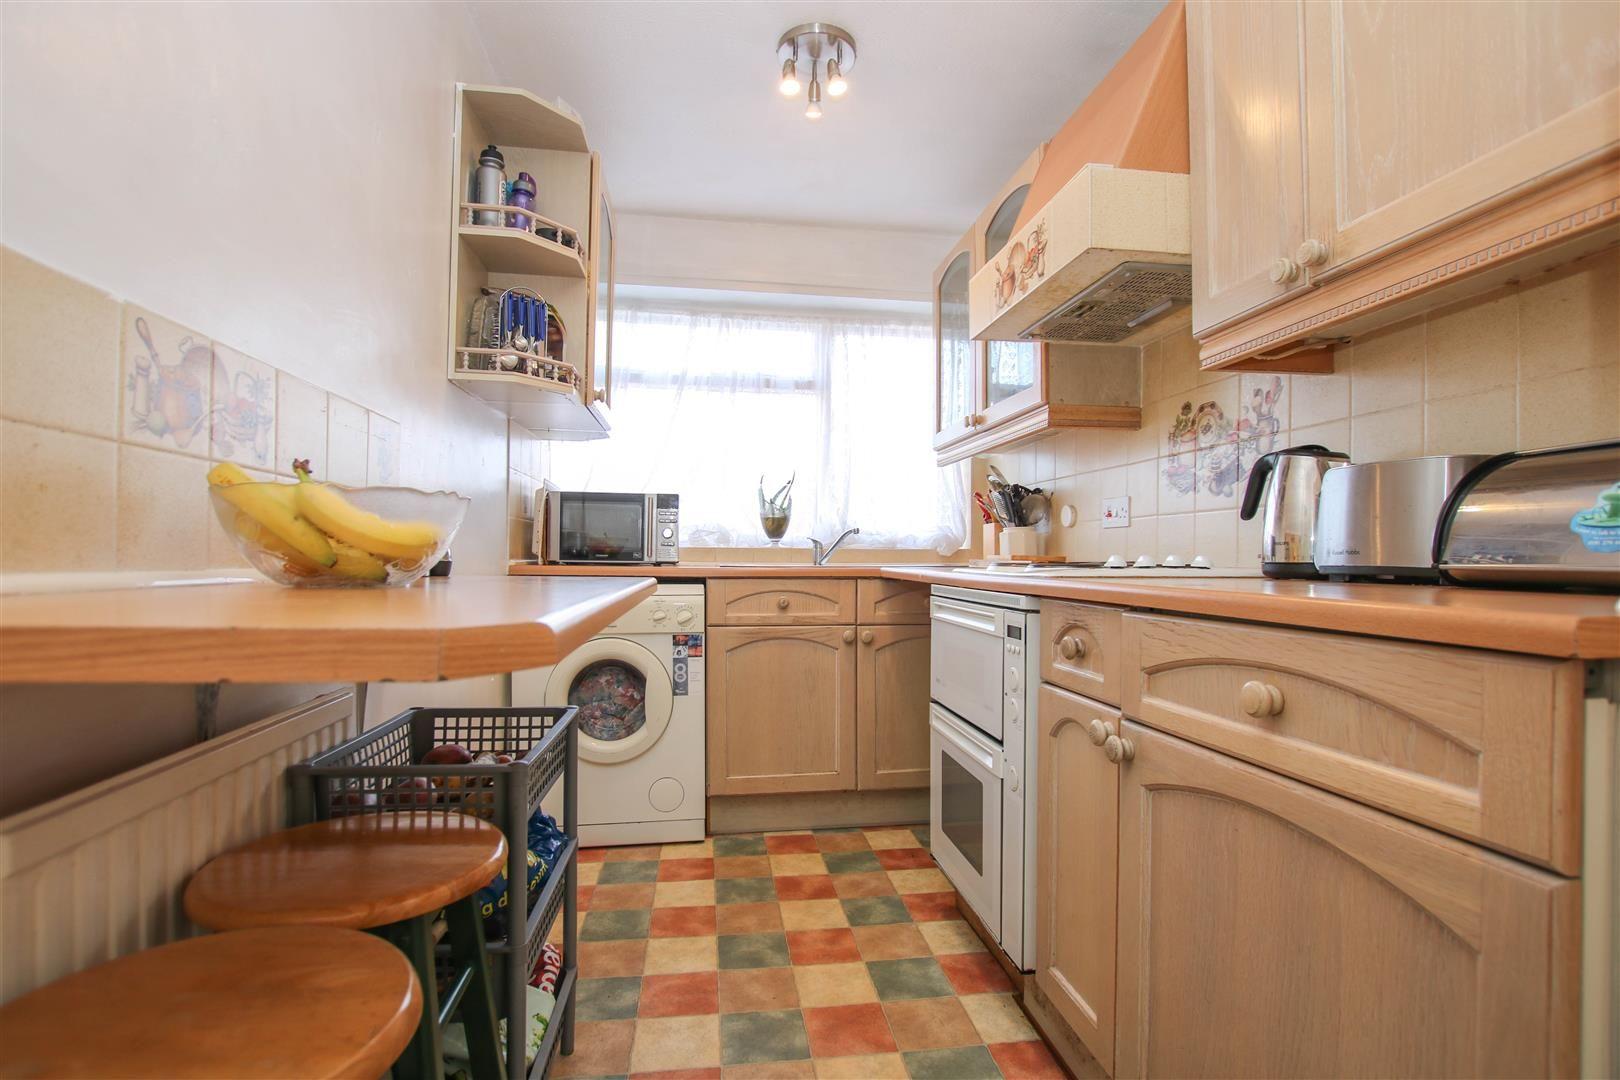 Property photo 1 of 9. Img_0973.Jpg